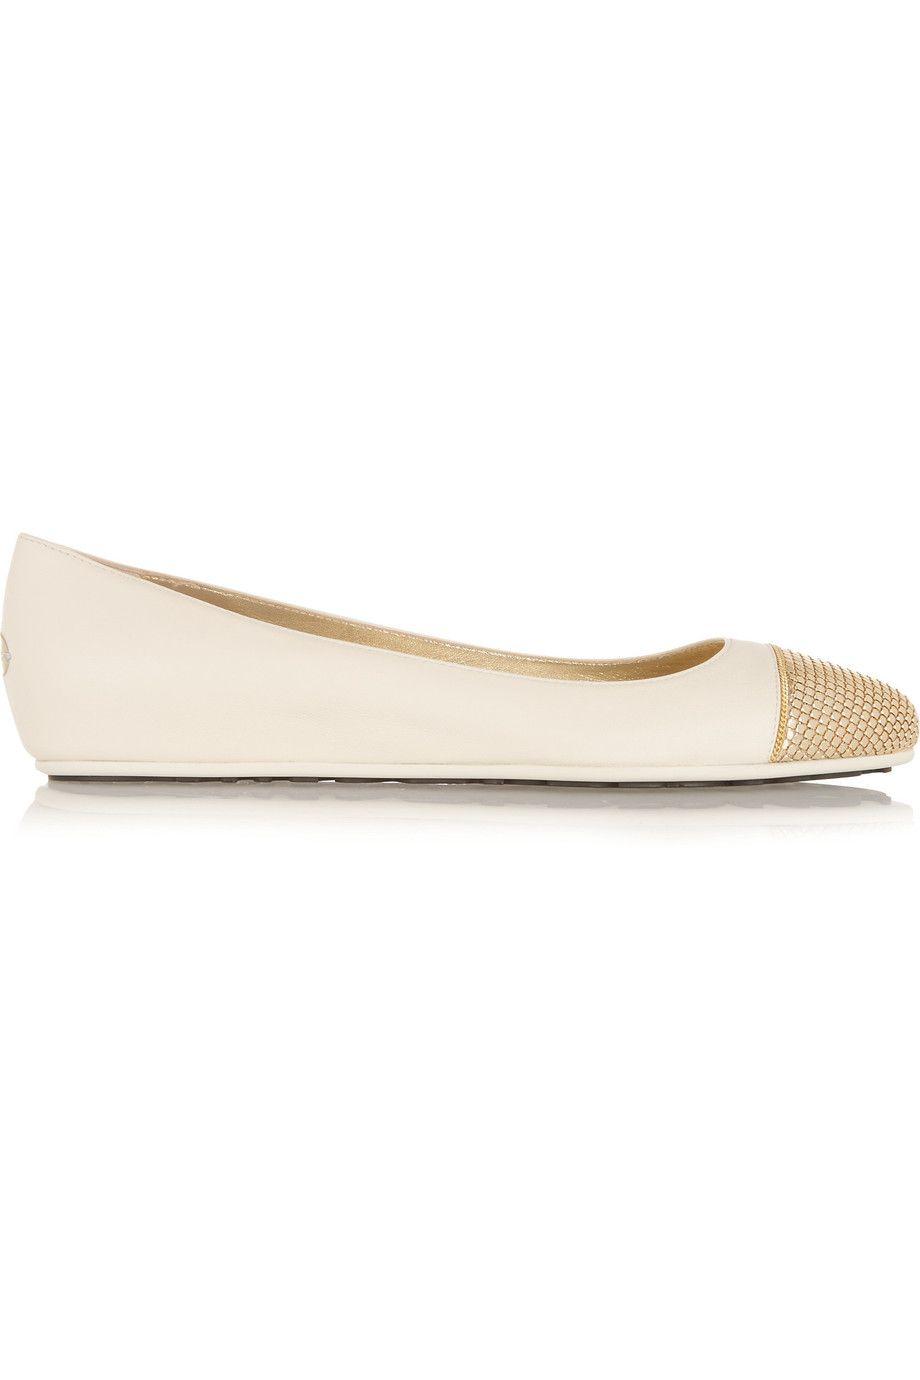 62ccbaa2f JIMMY CHOO Waine Embellished Leather Wedge Ballet Flats. #jimmychoo #shoes # flats